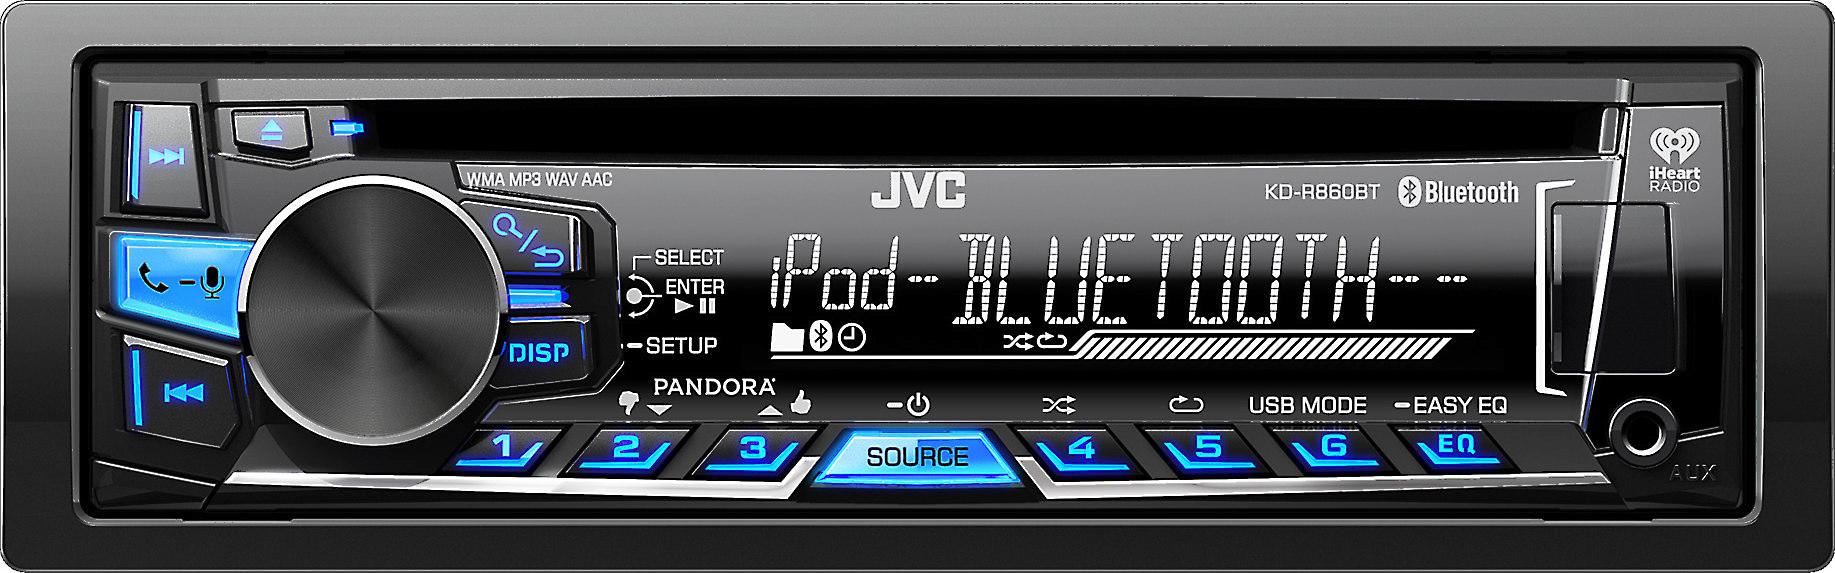 JVC KD-R860BT CD receiver at Crutchfield on